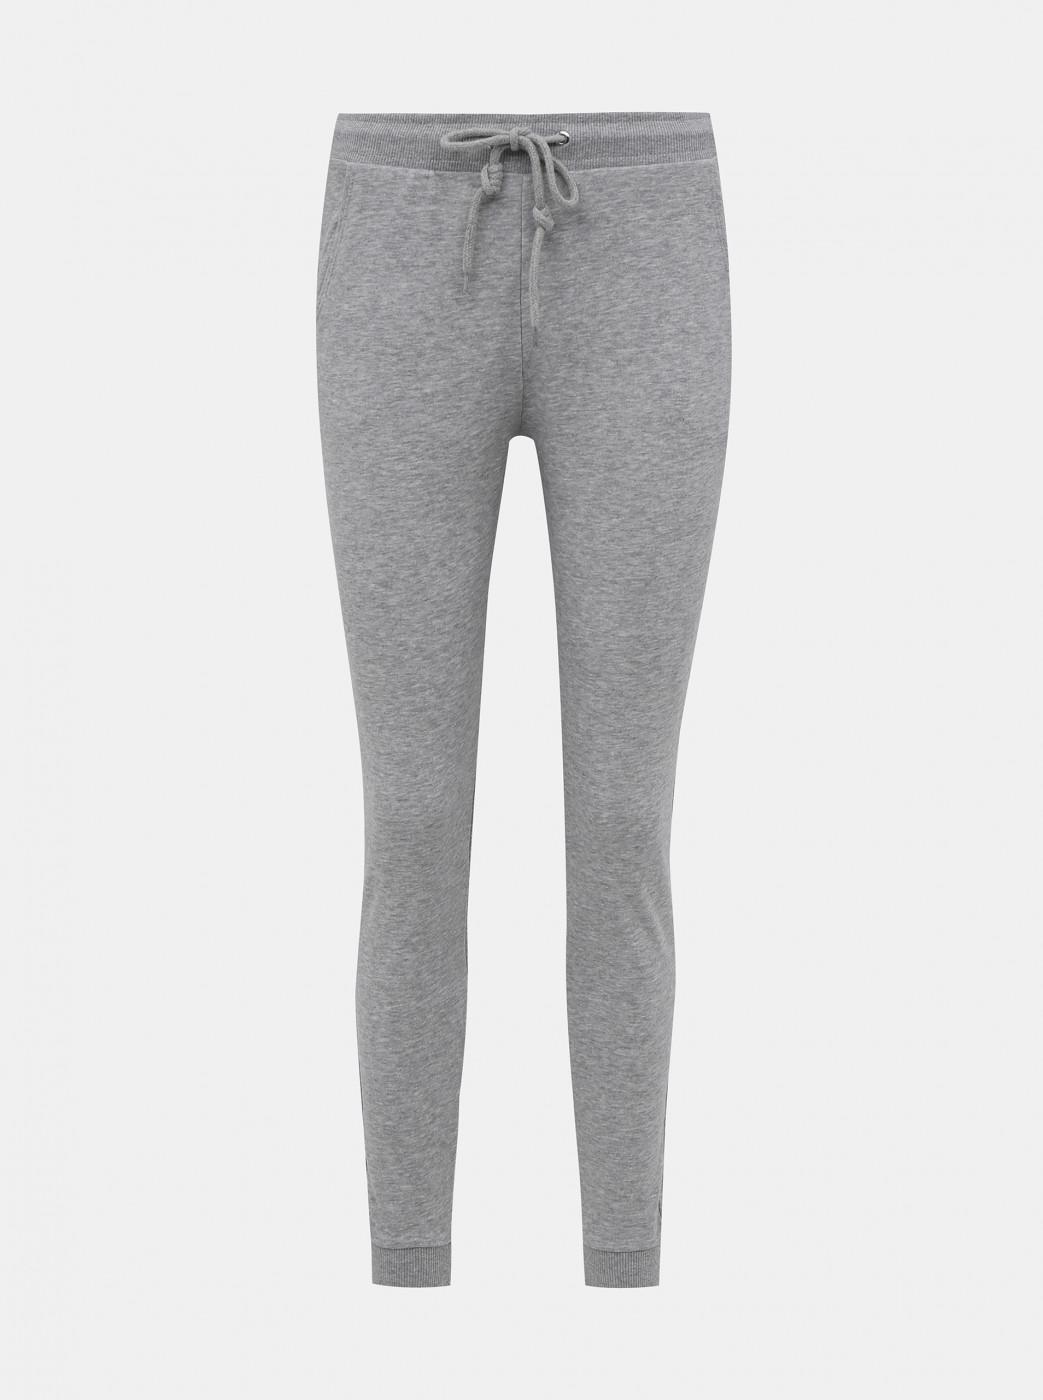 TALLY WEiJL Bebok Grey Sweatpants